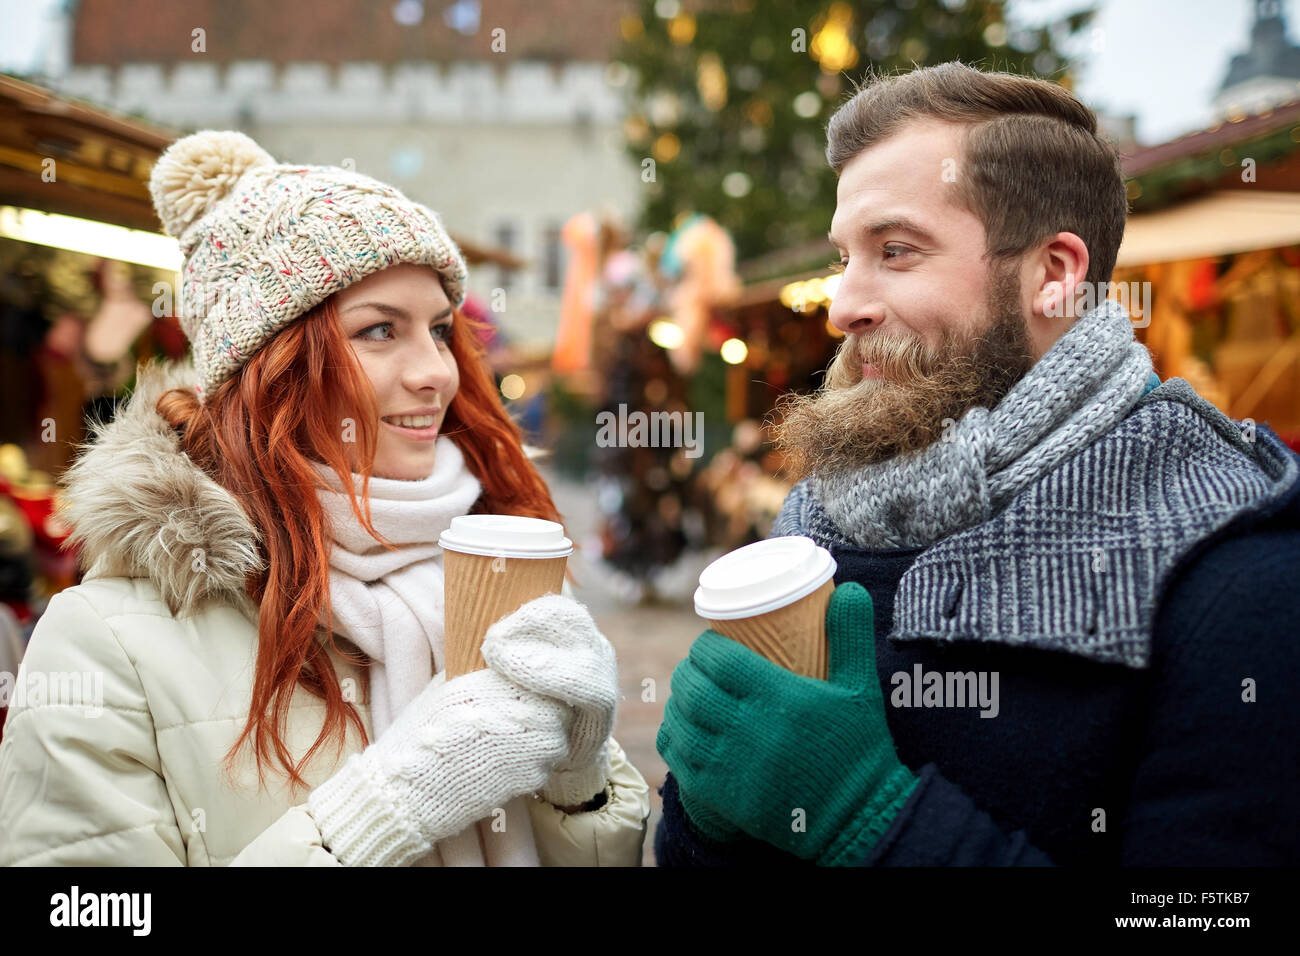 Feliz pareja beber café en la calle Old Town Imagen De Stock